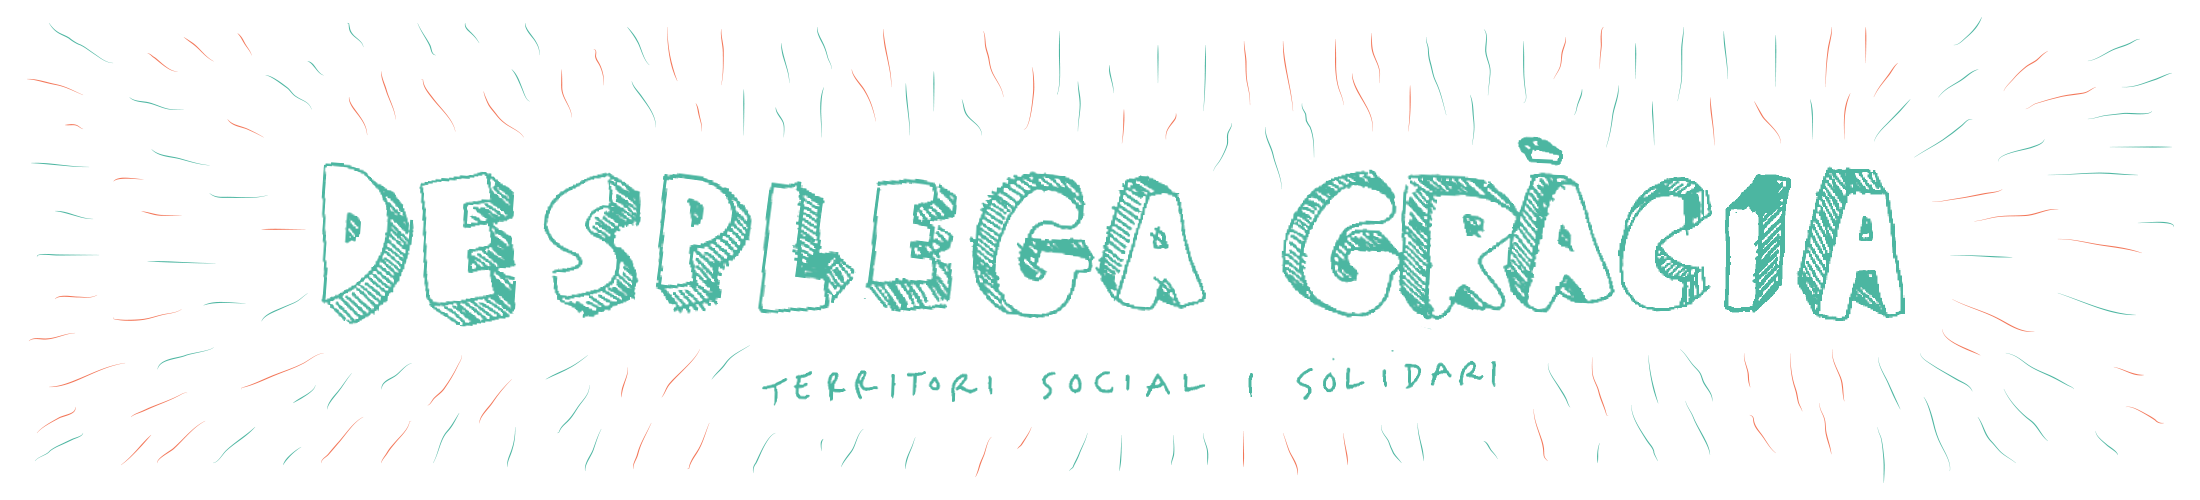 Banner Economia Social Solidària